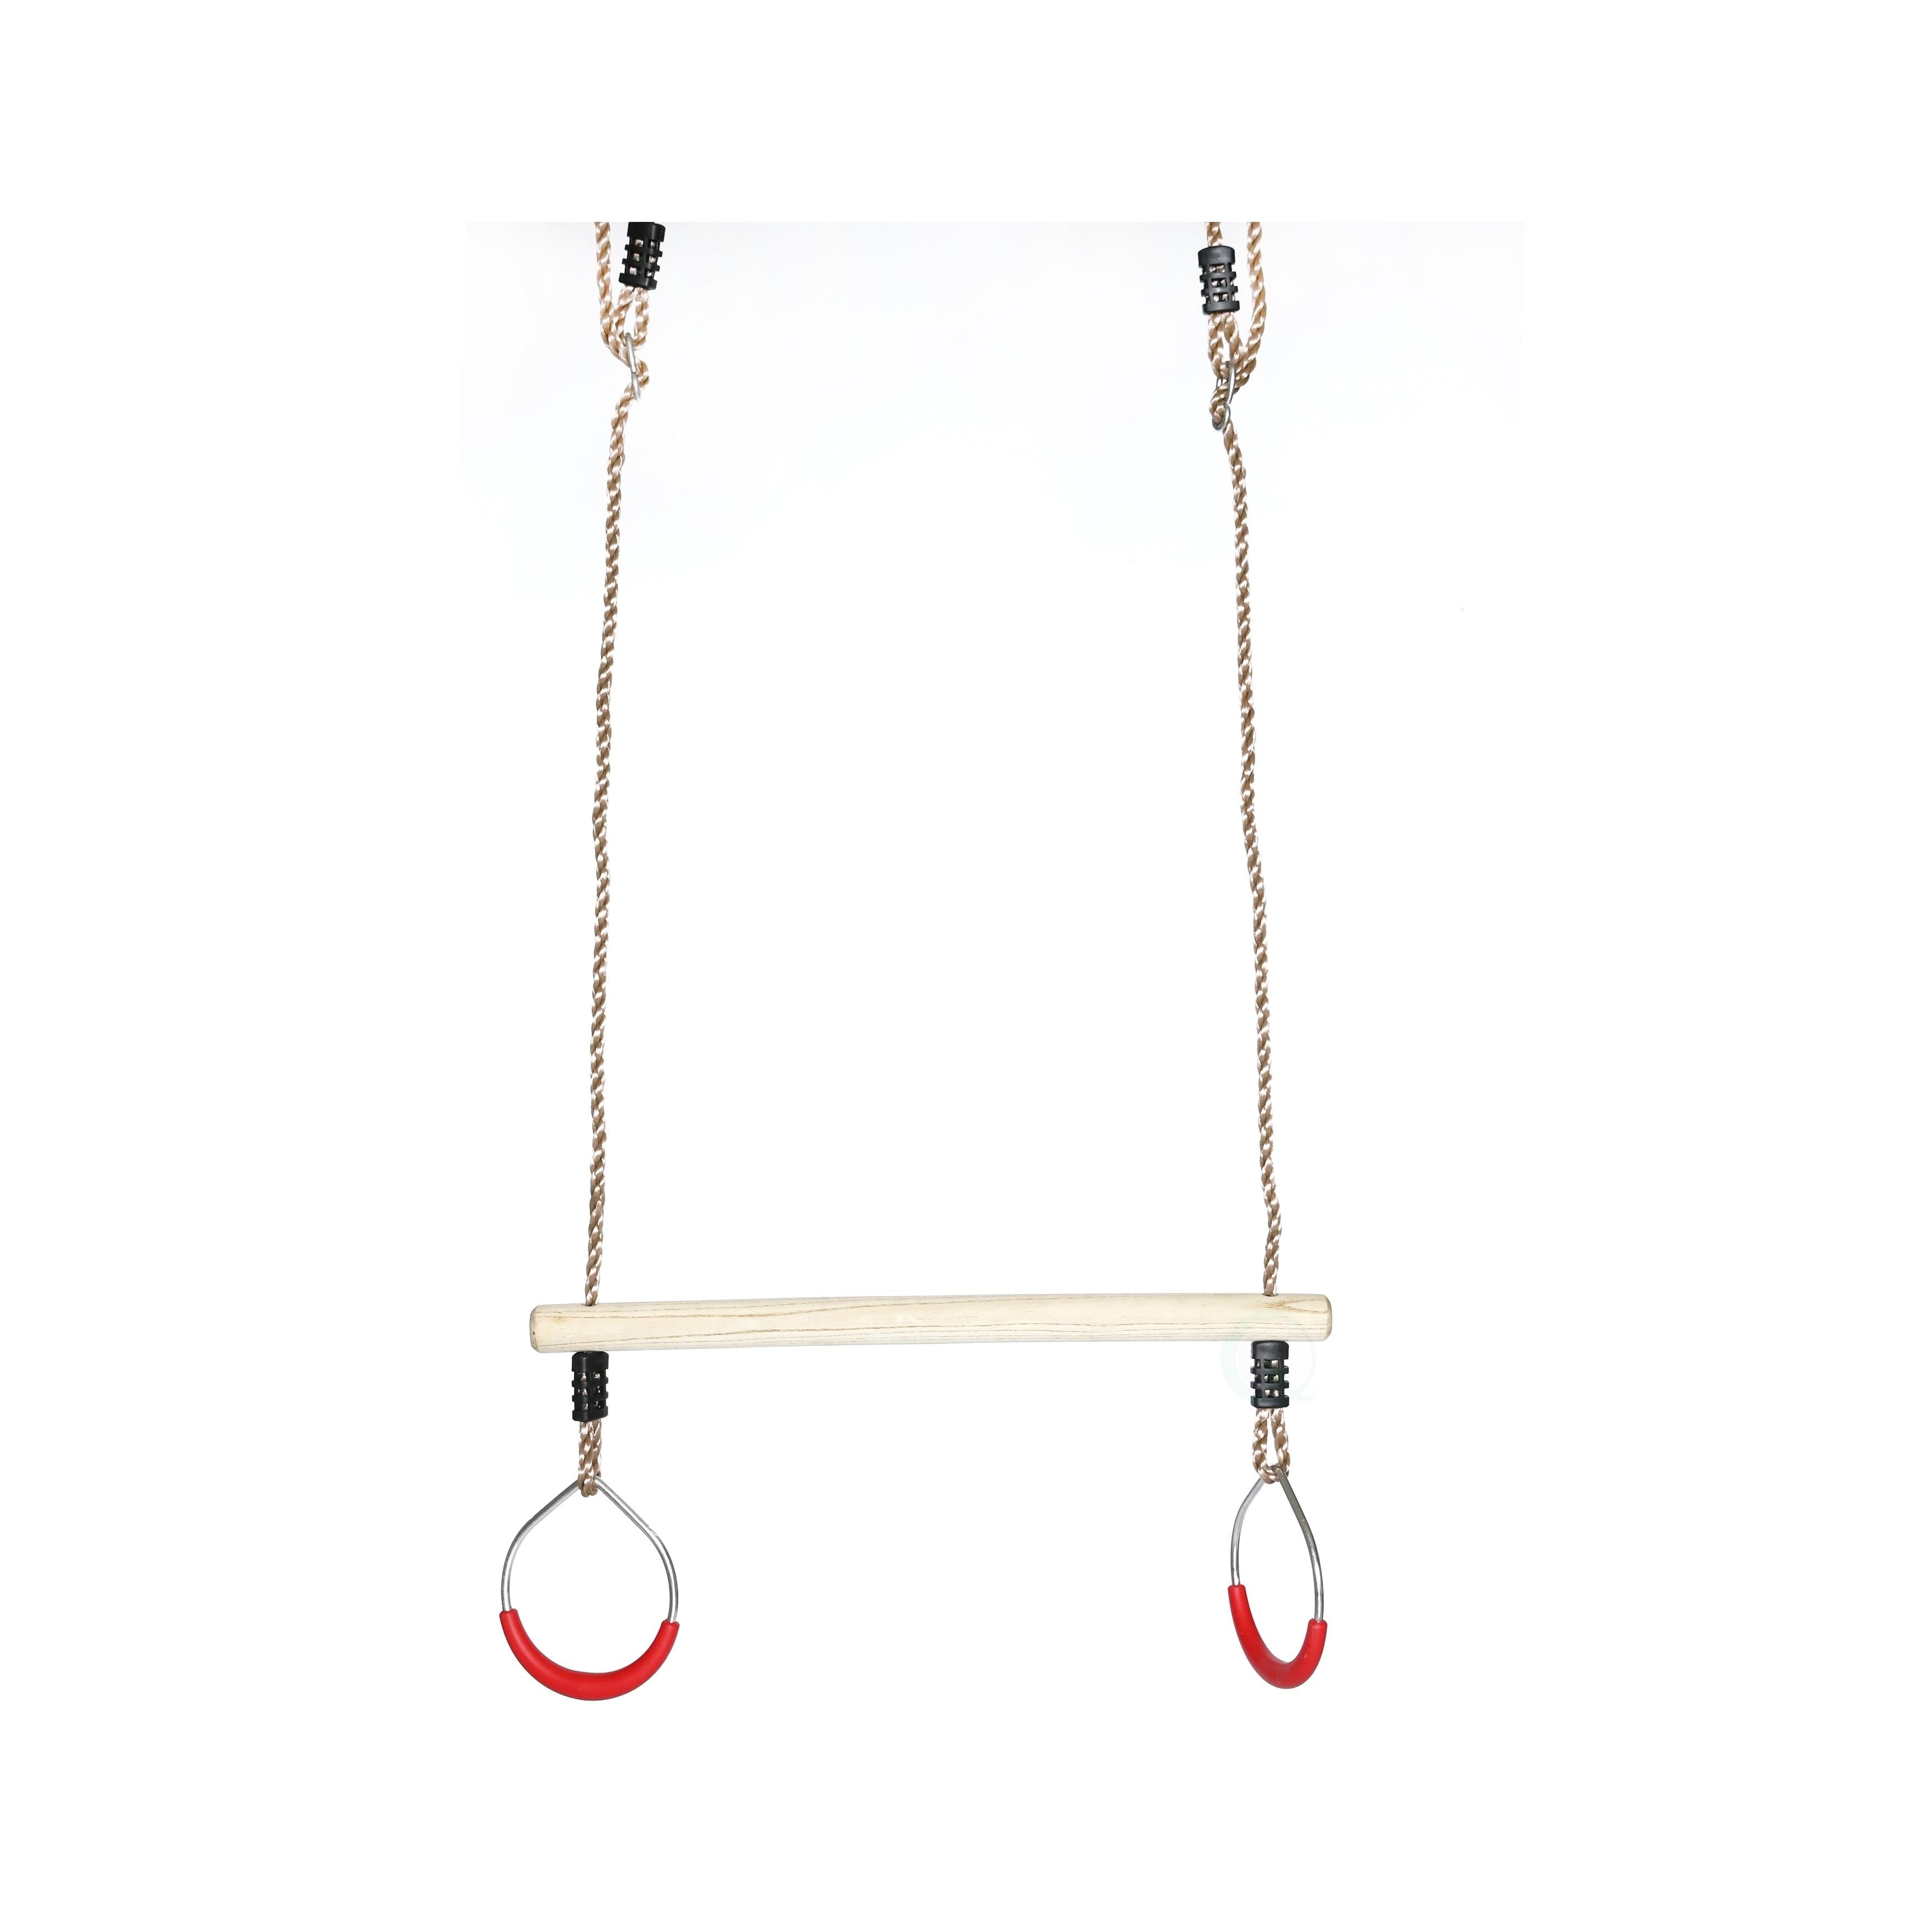 Standard Trapeze bar W//Rings